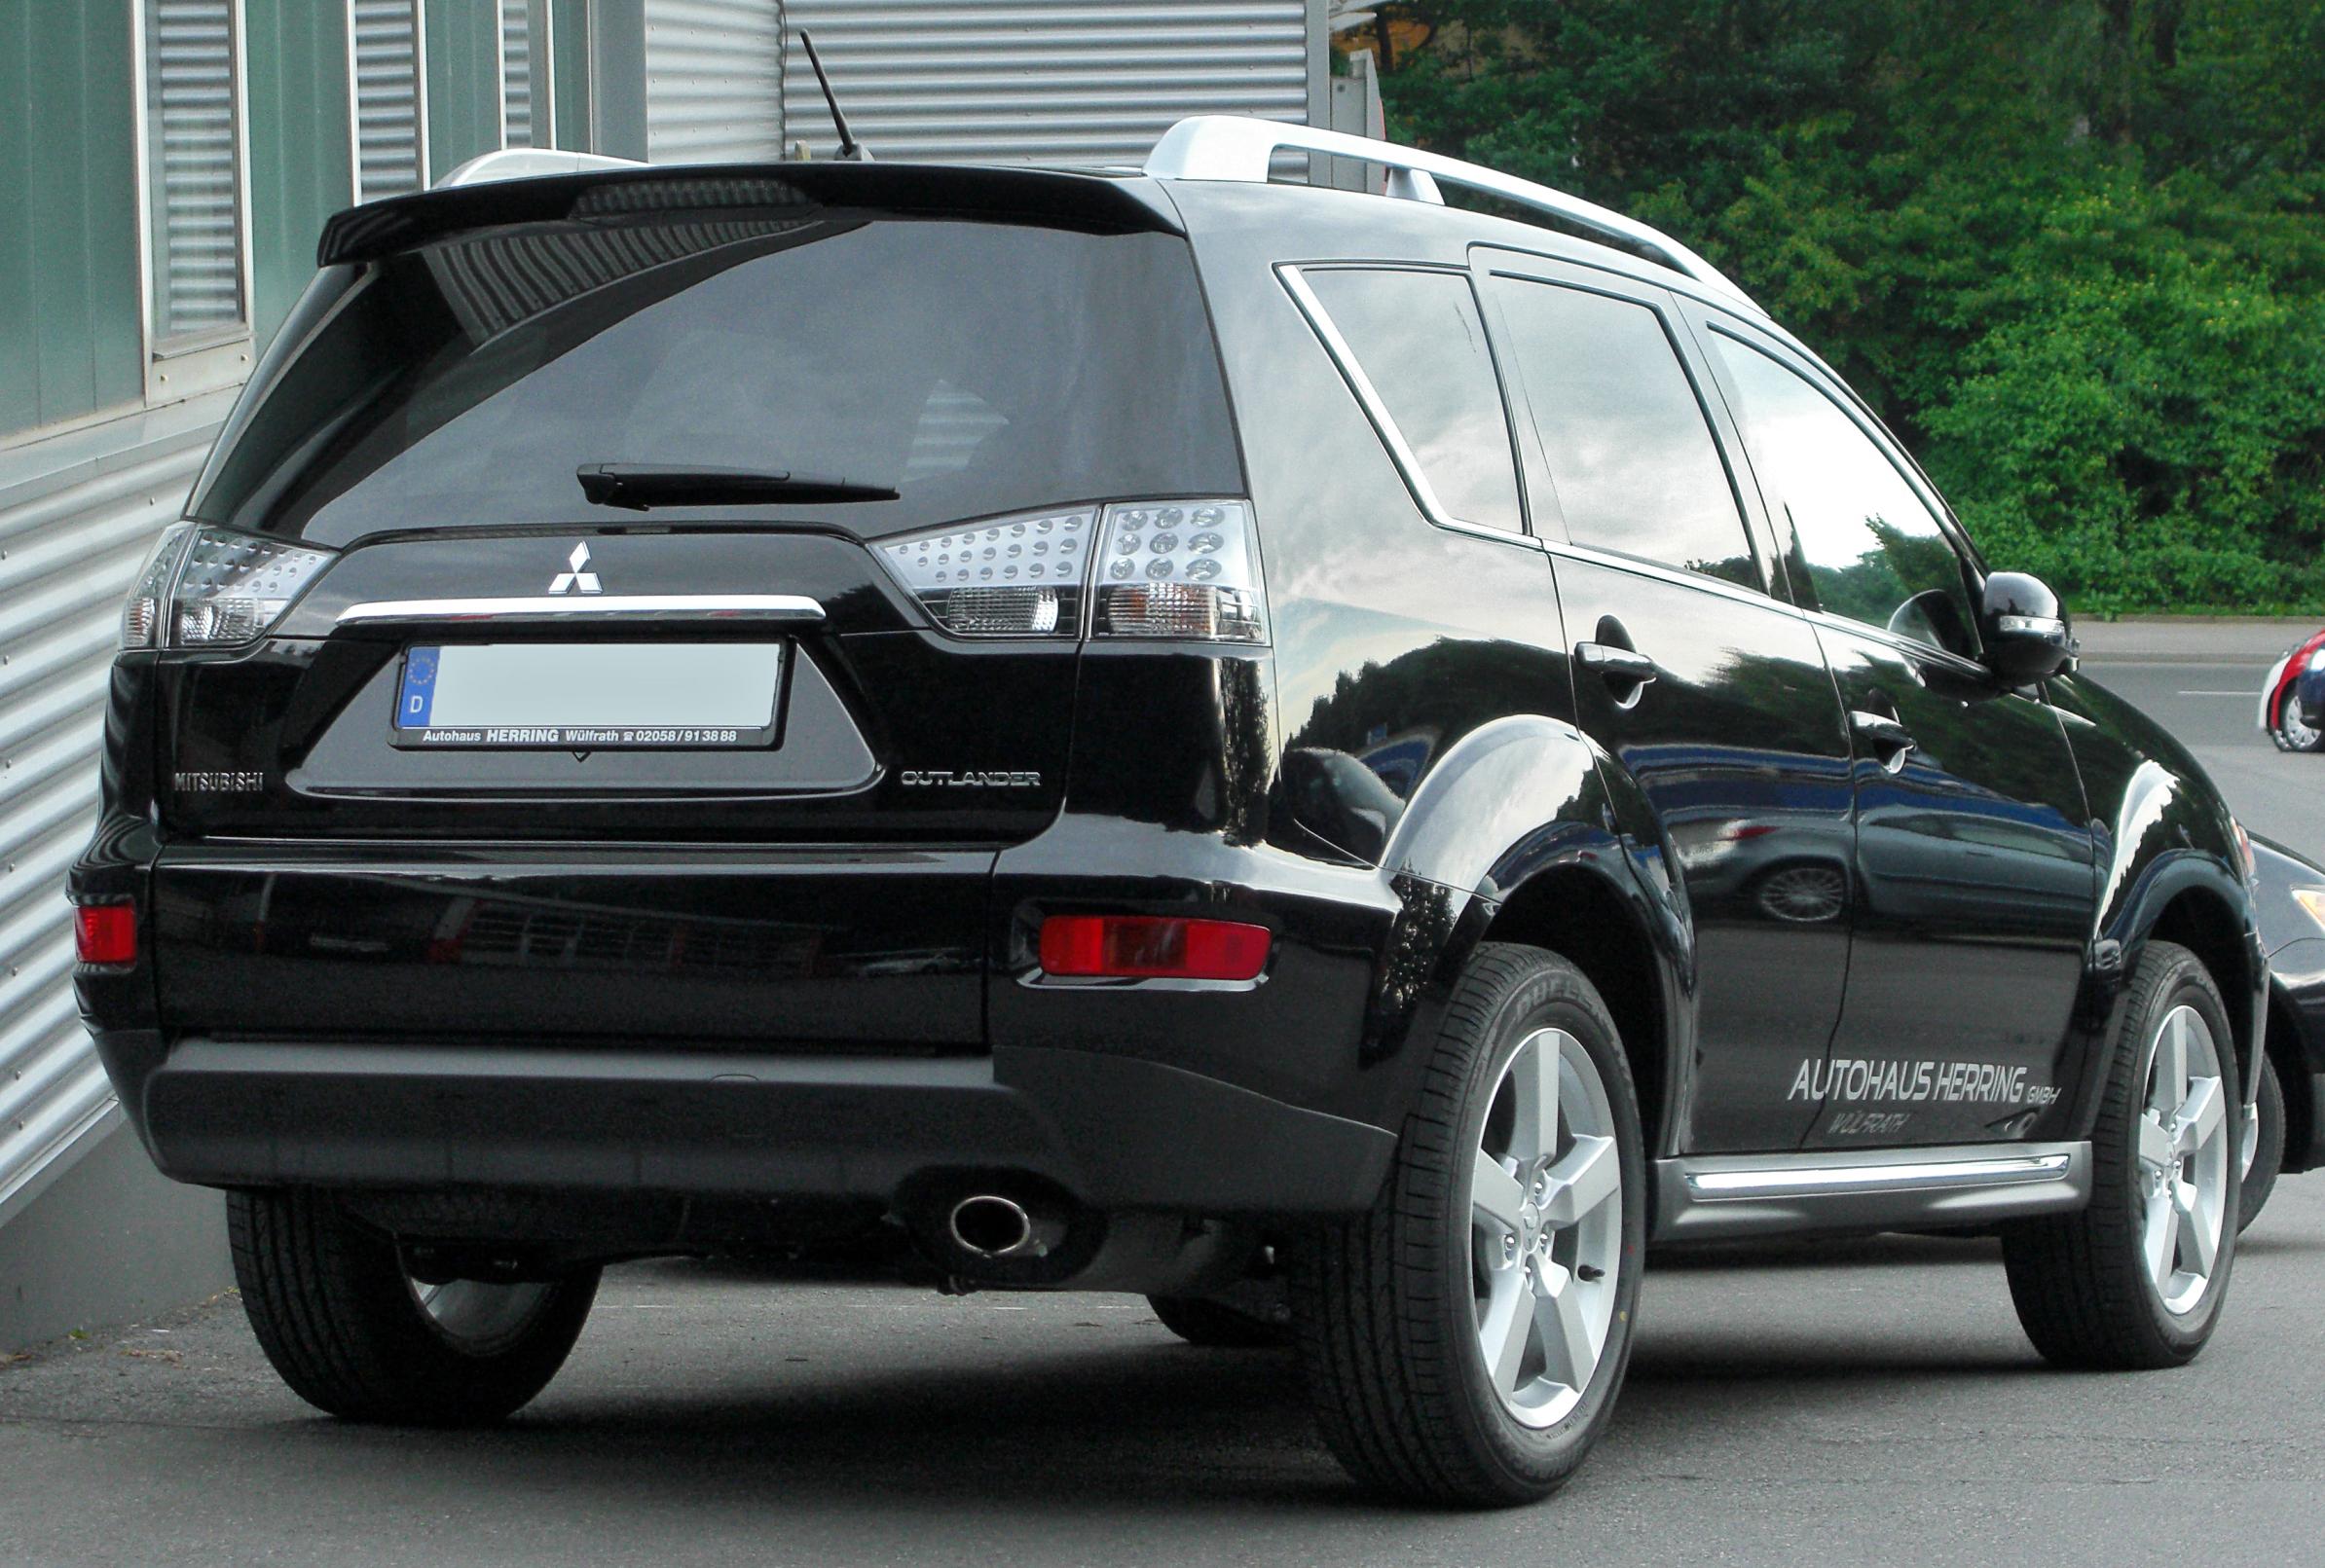 File:Mitsubishi Outlander II Facelift rear 20100606.jpg - Wikimedia Commons